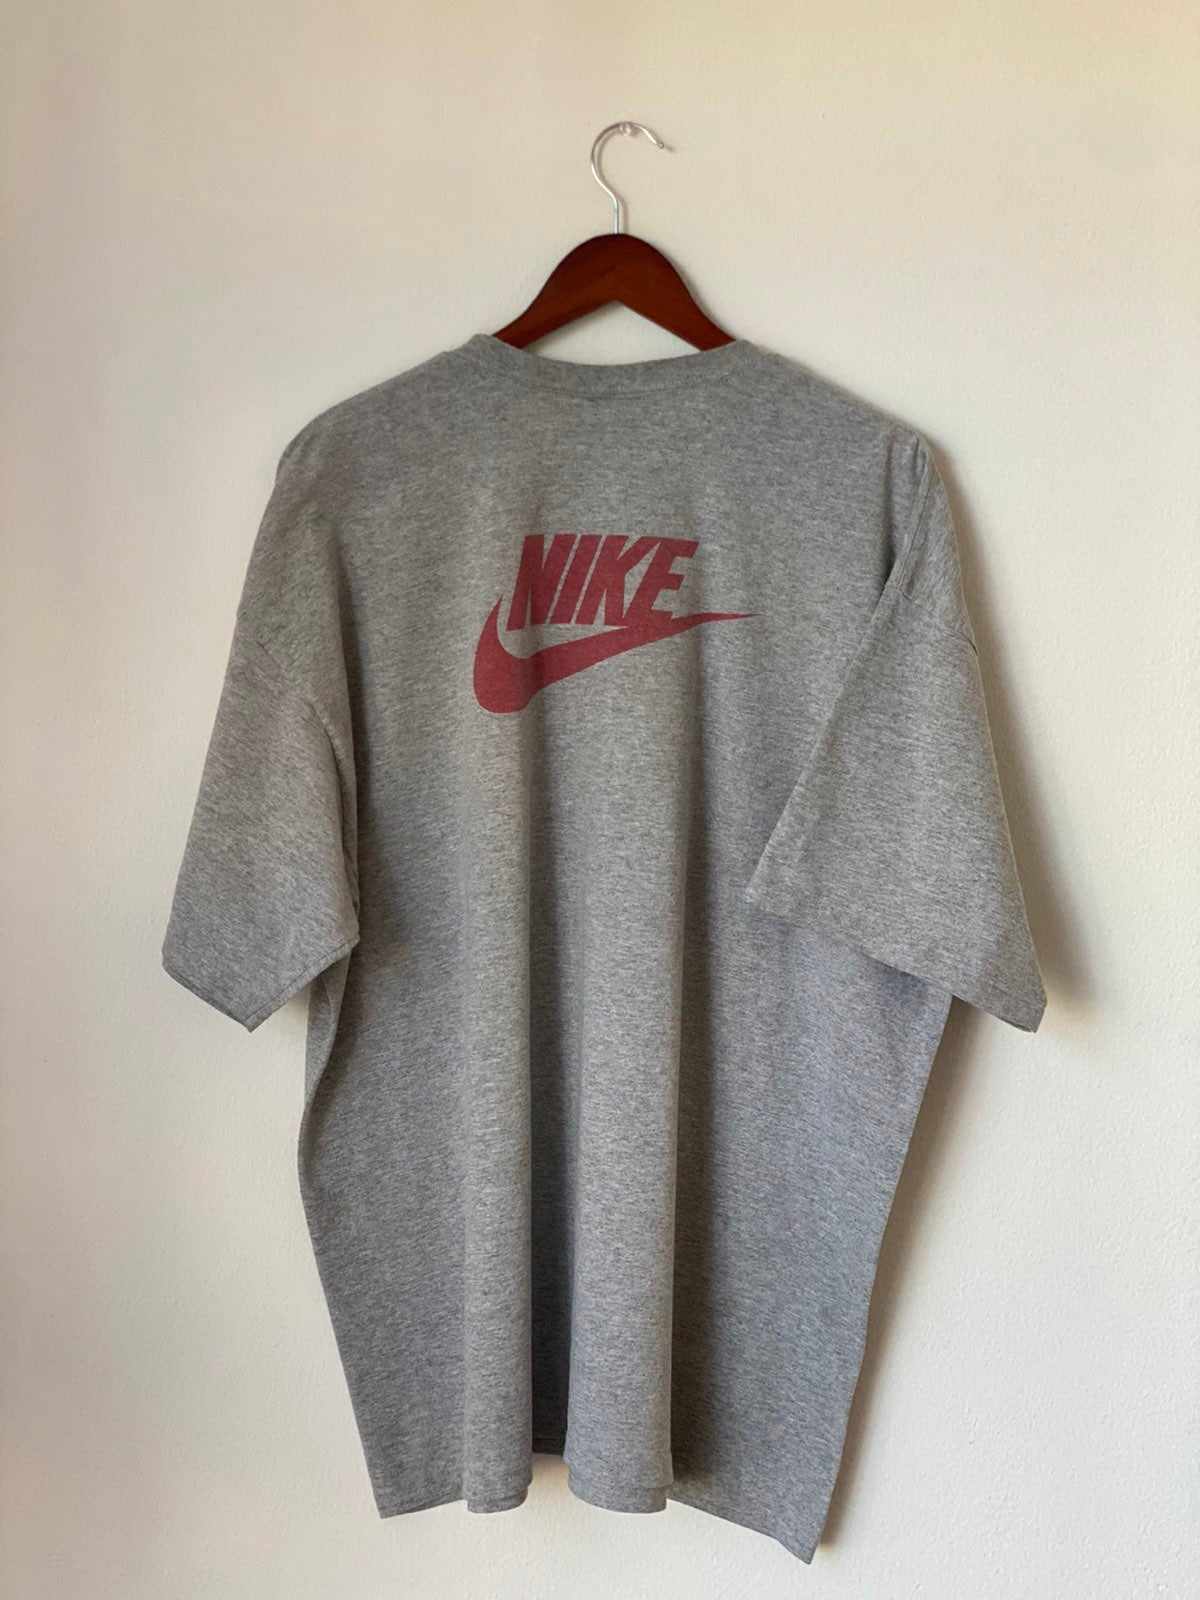 Vintage Nike Shirt Sz M